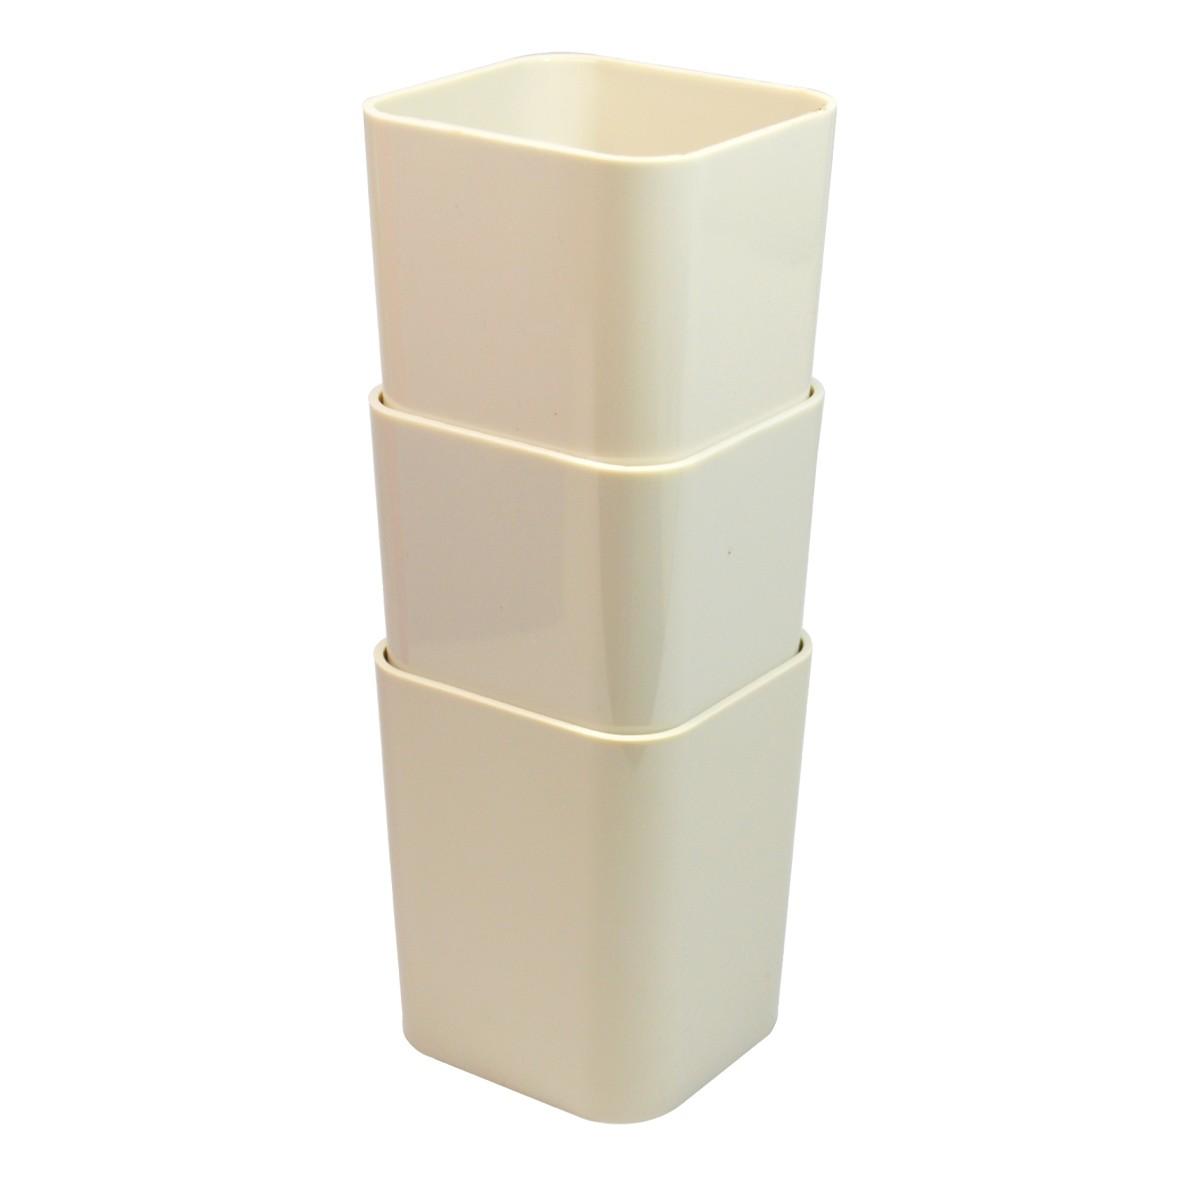 Cesta Organizadora de Plastico 3 Pecas 76x8 cm Retangular Empilhavel Cinza - Dello